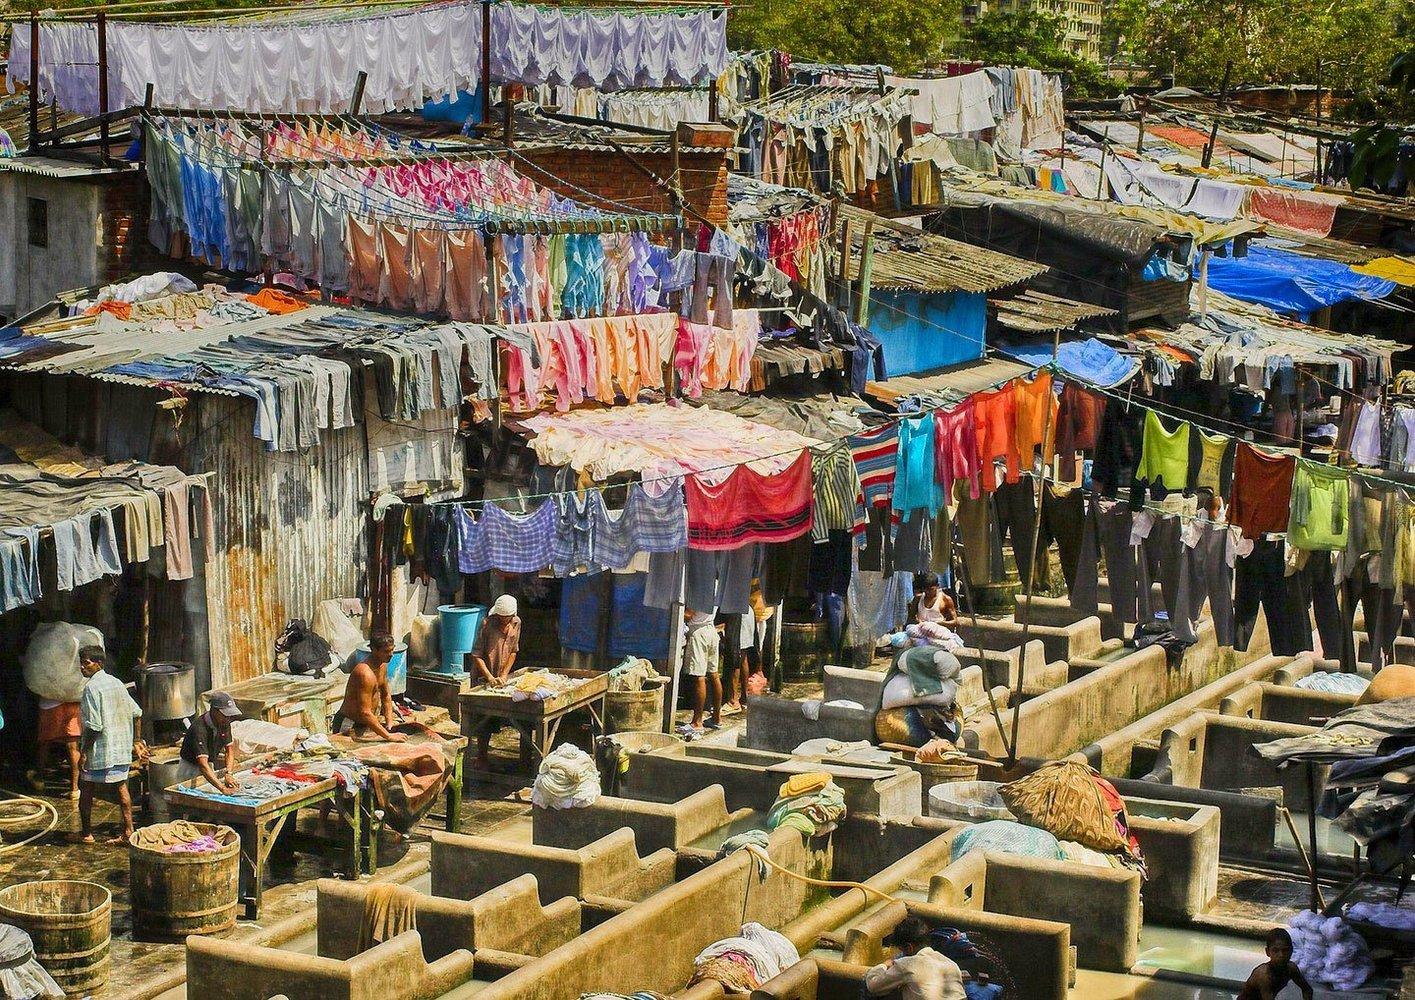 Half-day Small-Group Tour: See the Real Mumbai - Tour